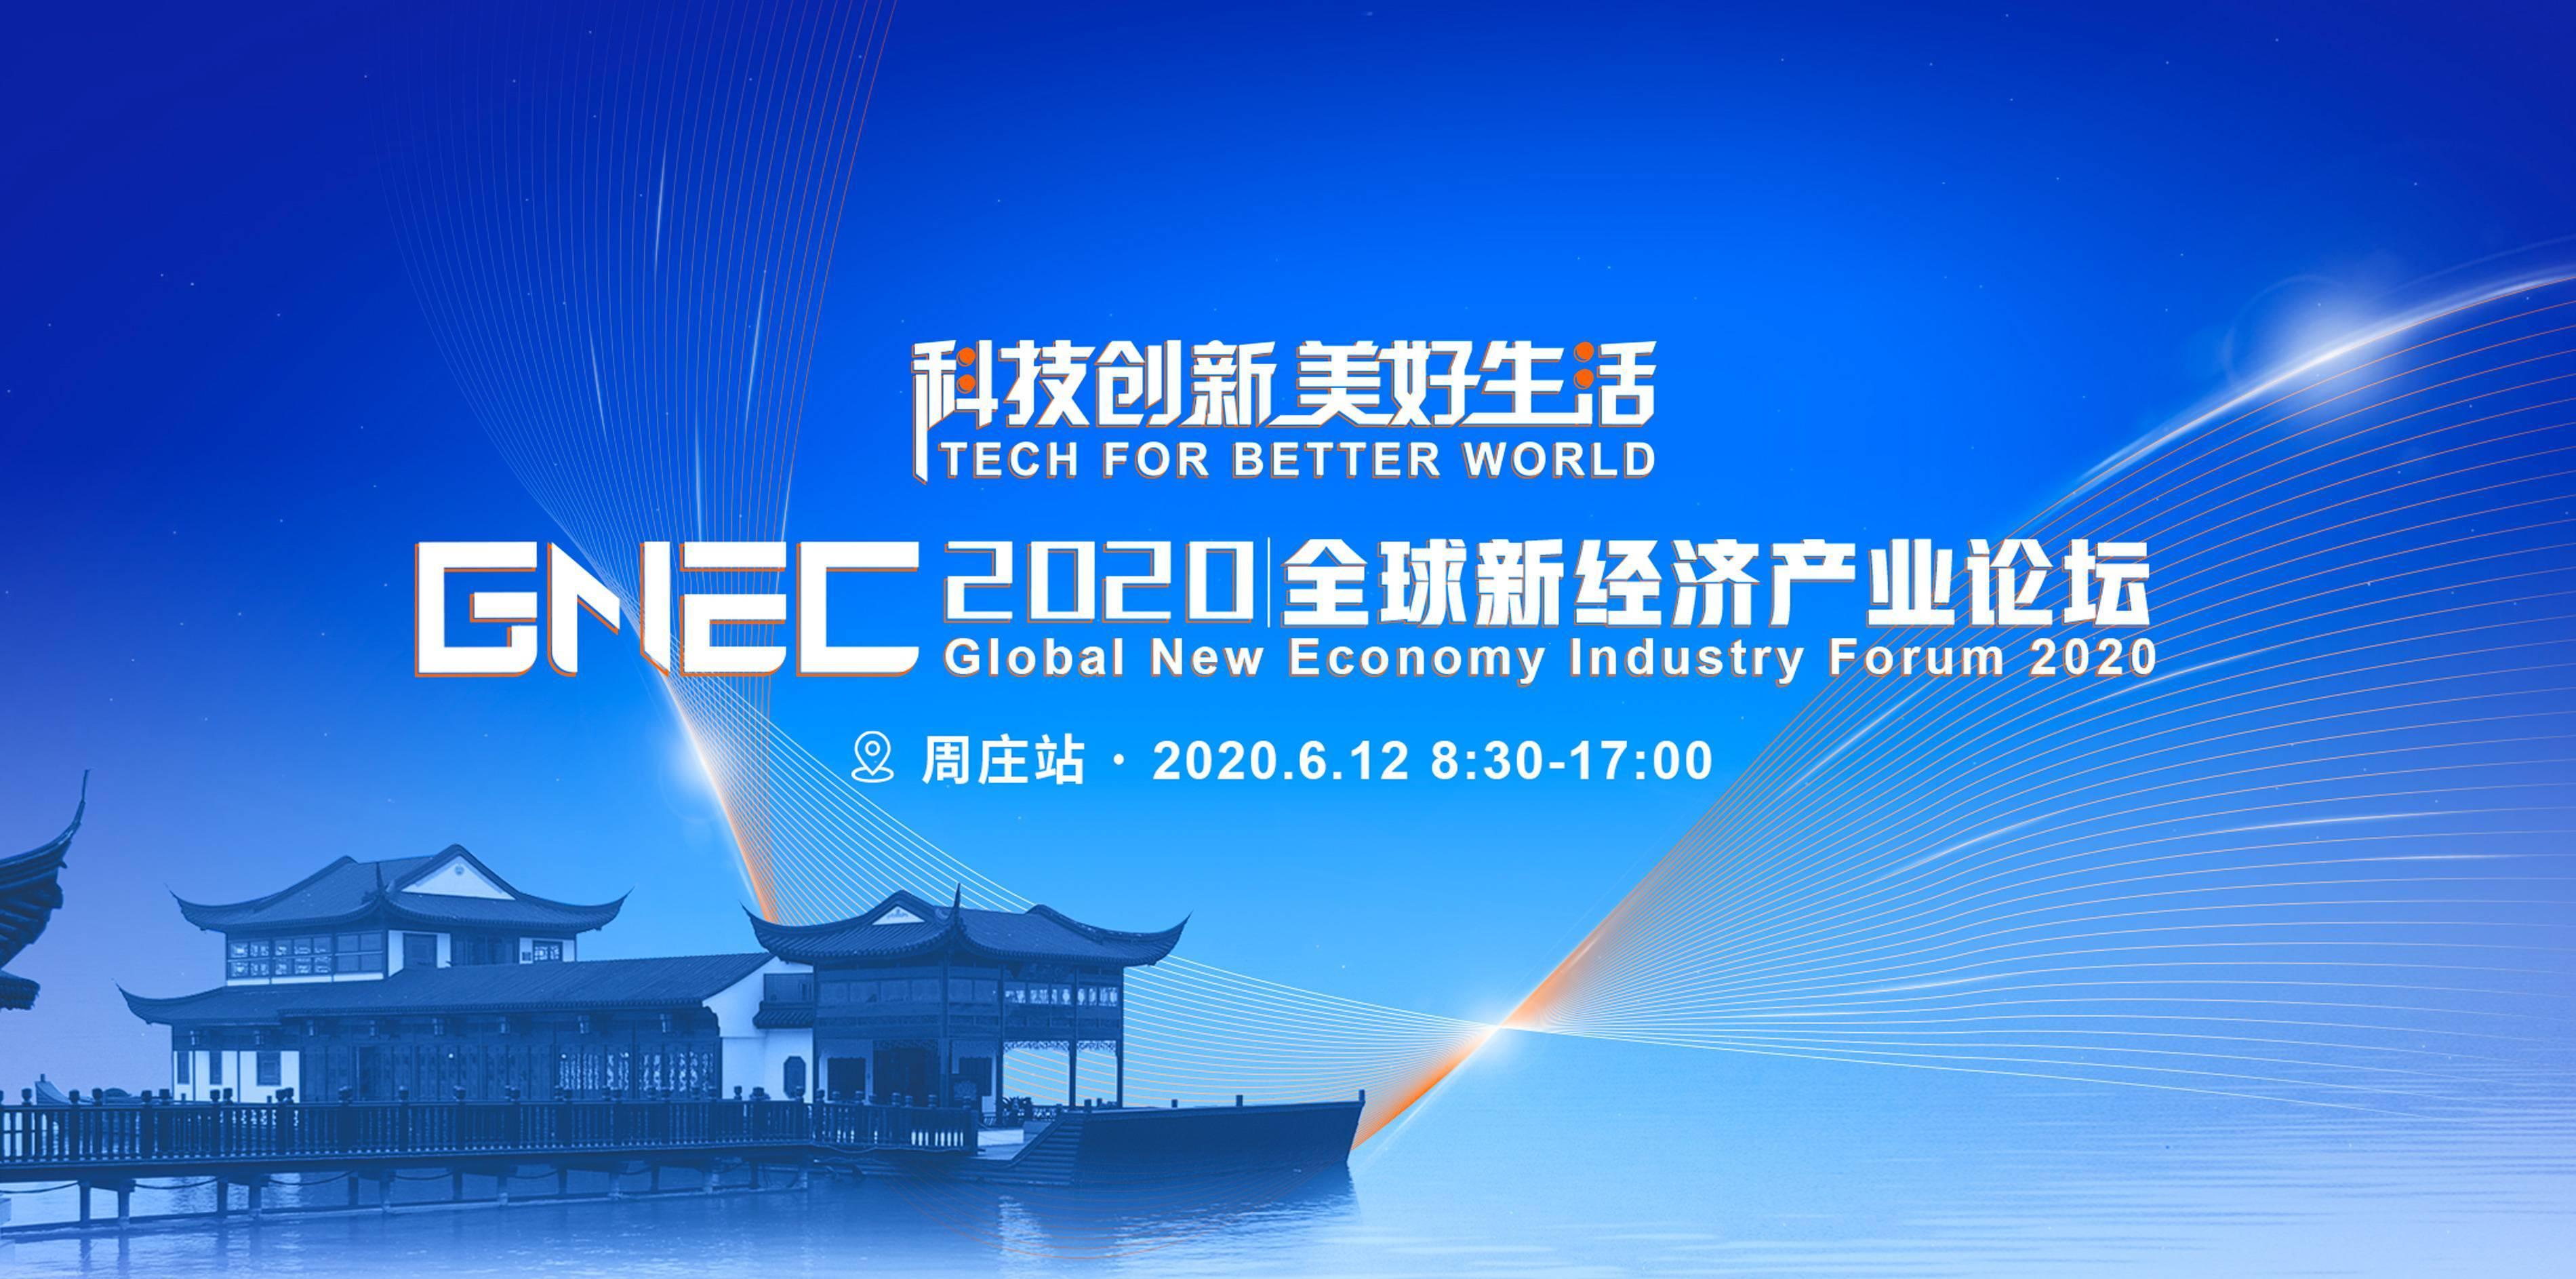 GNEC 2020 全球经济产业论坛-周庄站